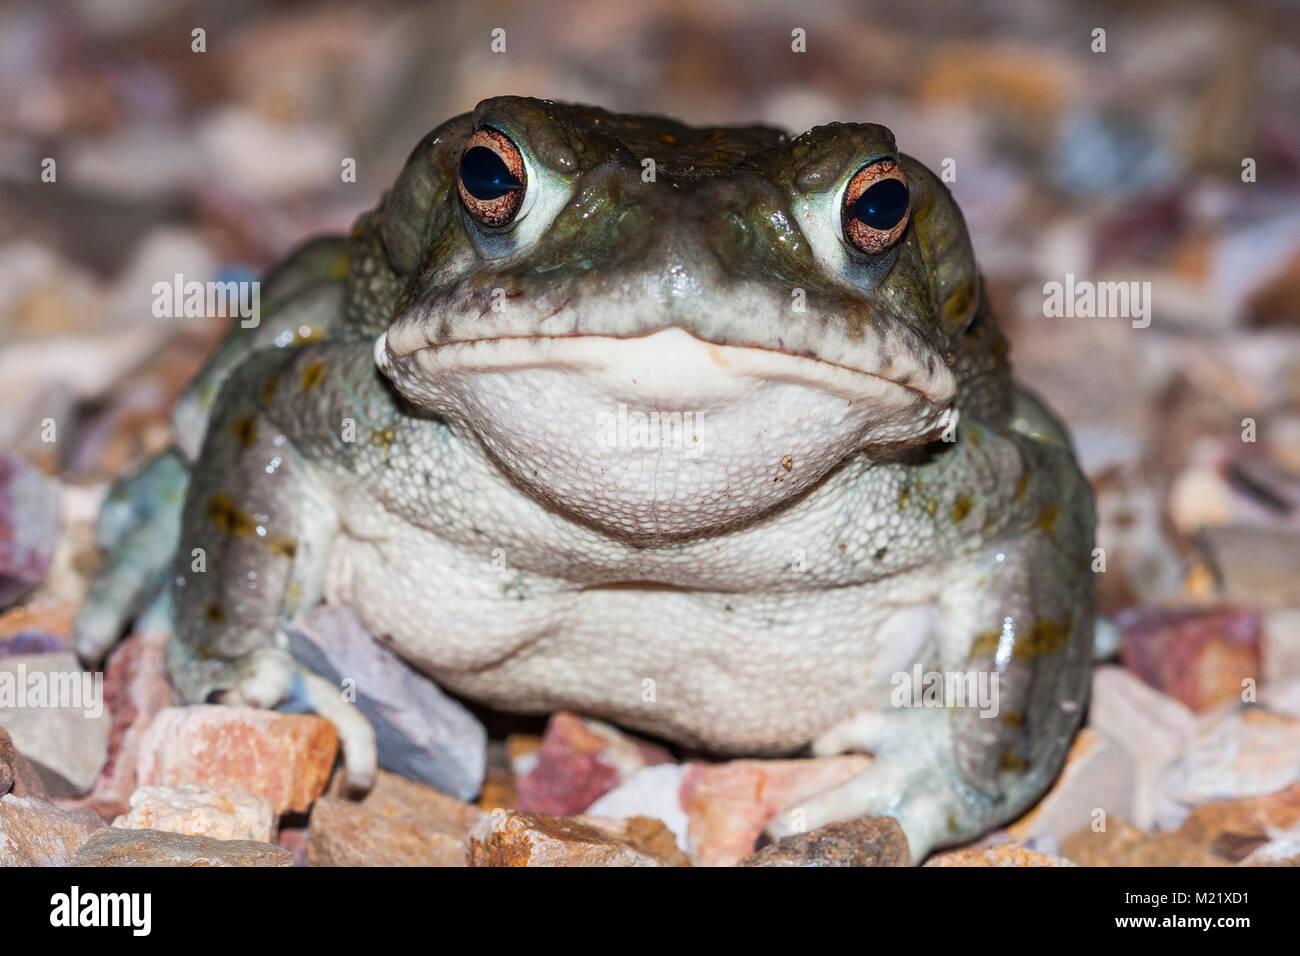 The Colorado River toad (Incilius alvarius), the Sonoran Desert toad, is a psychoactive toad found in northern Mexico - Stock Image